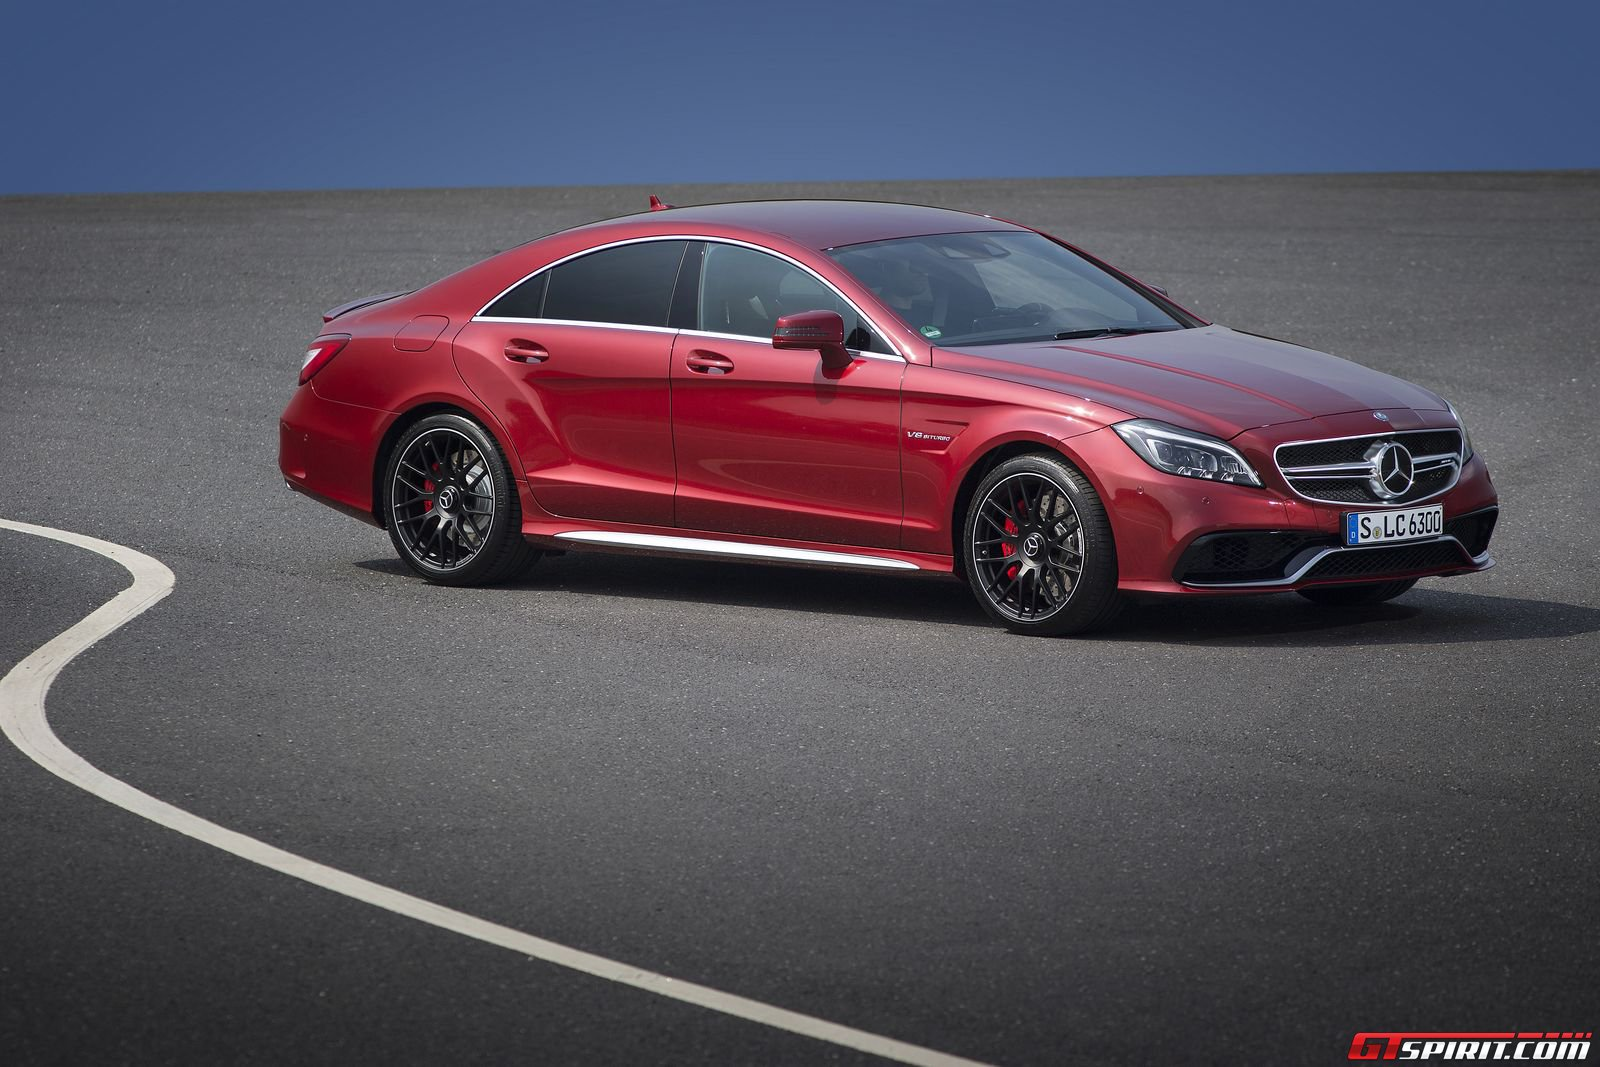 2015 mercedes benz cls 63 s amg review gtspirit for Mercedes benz amg cls63